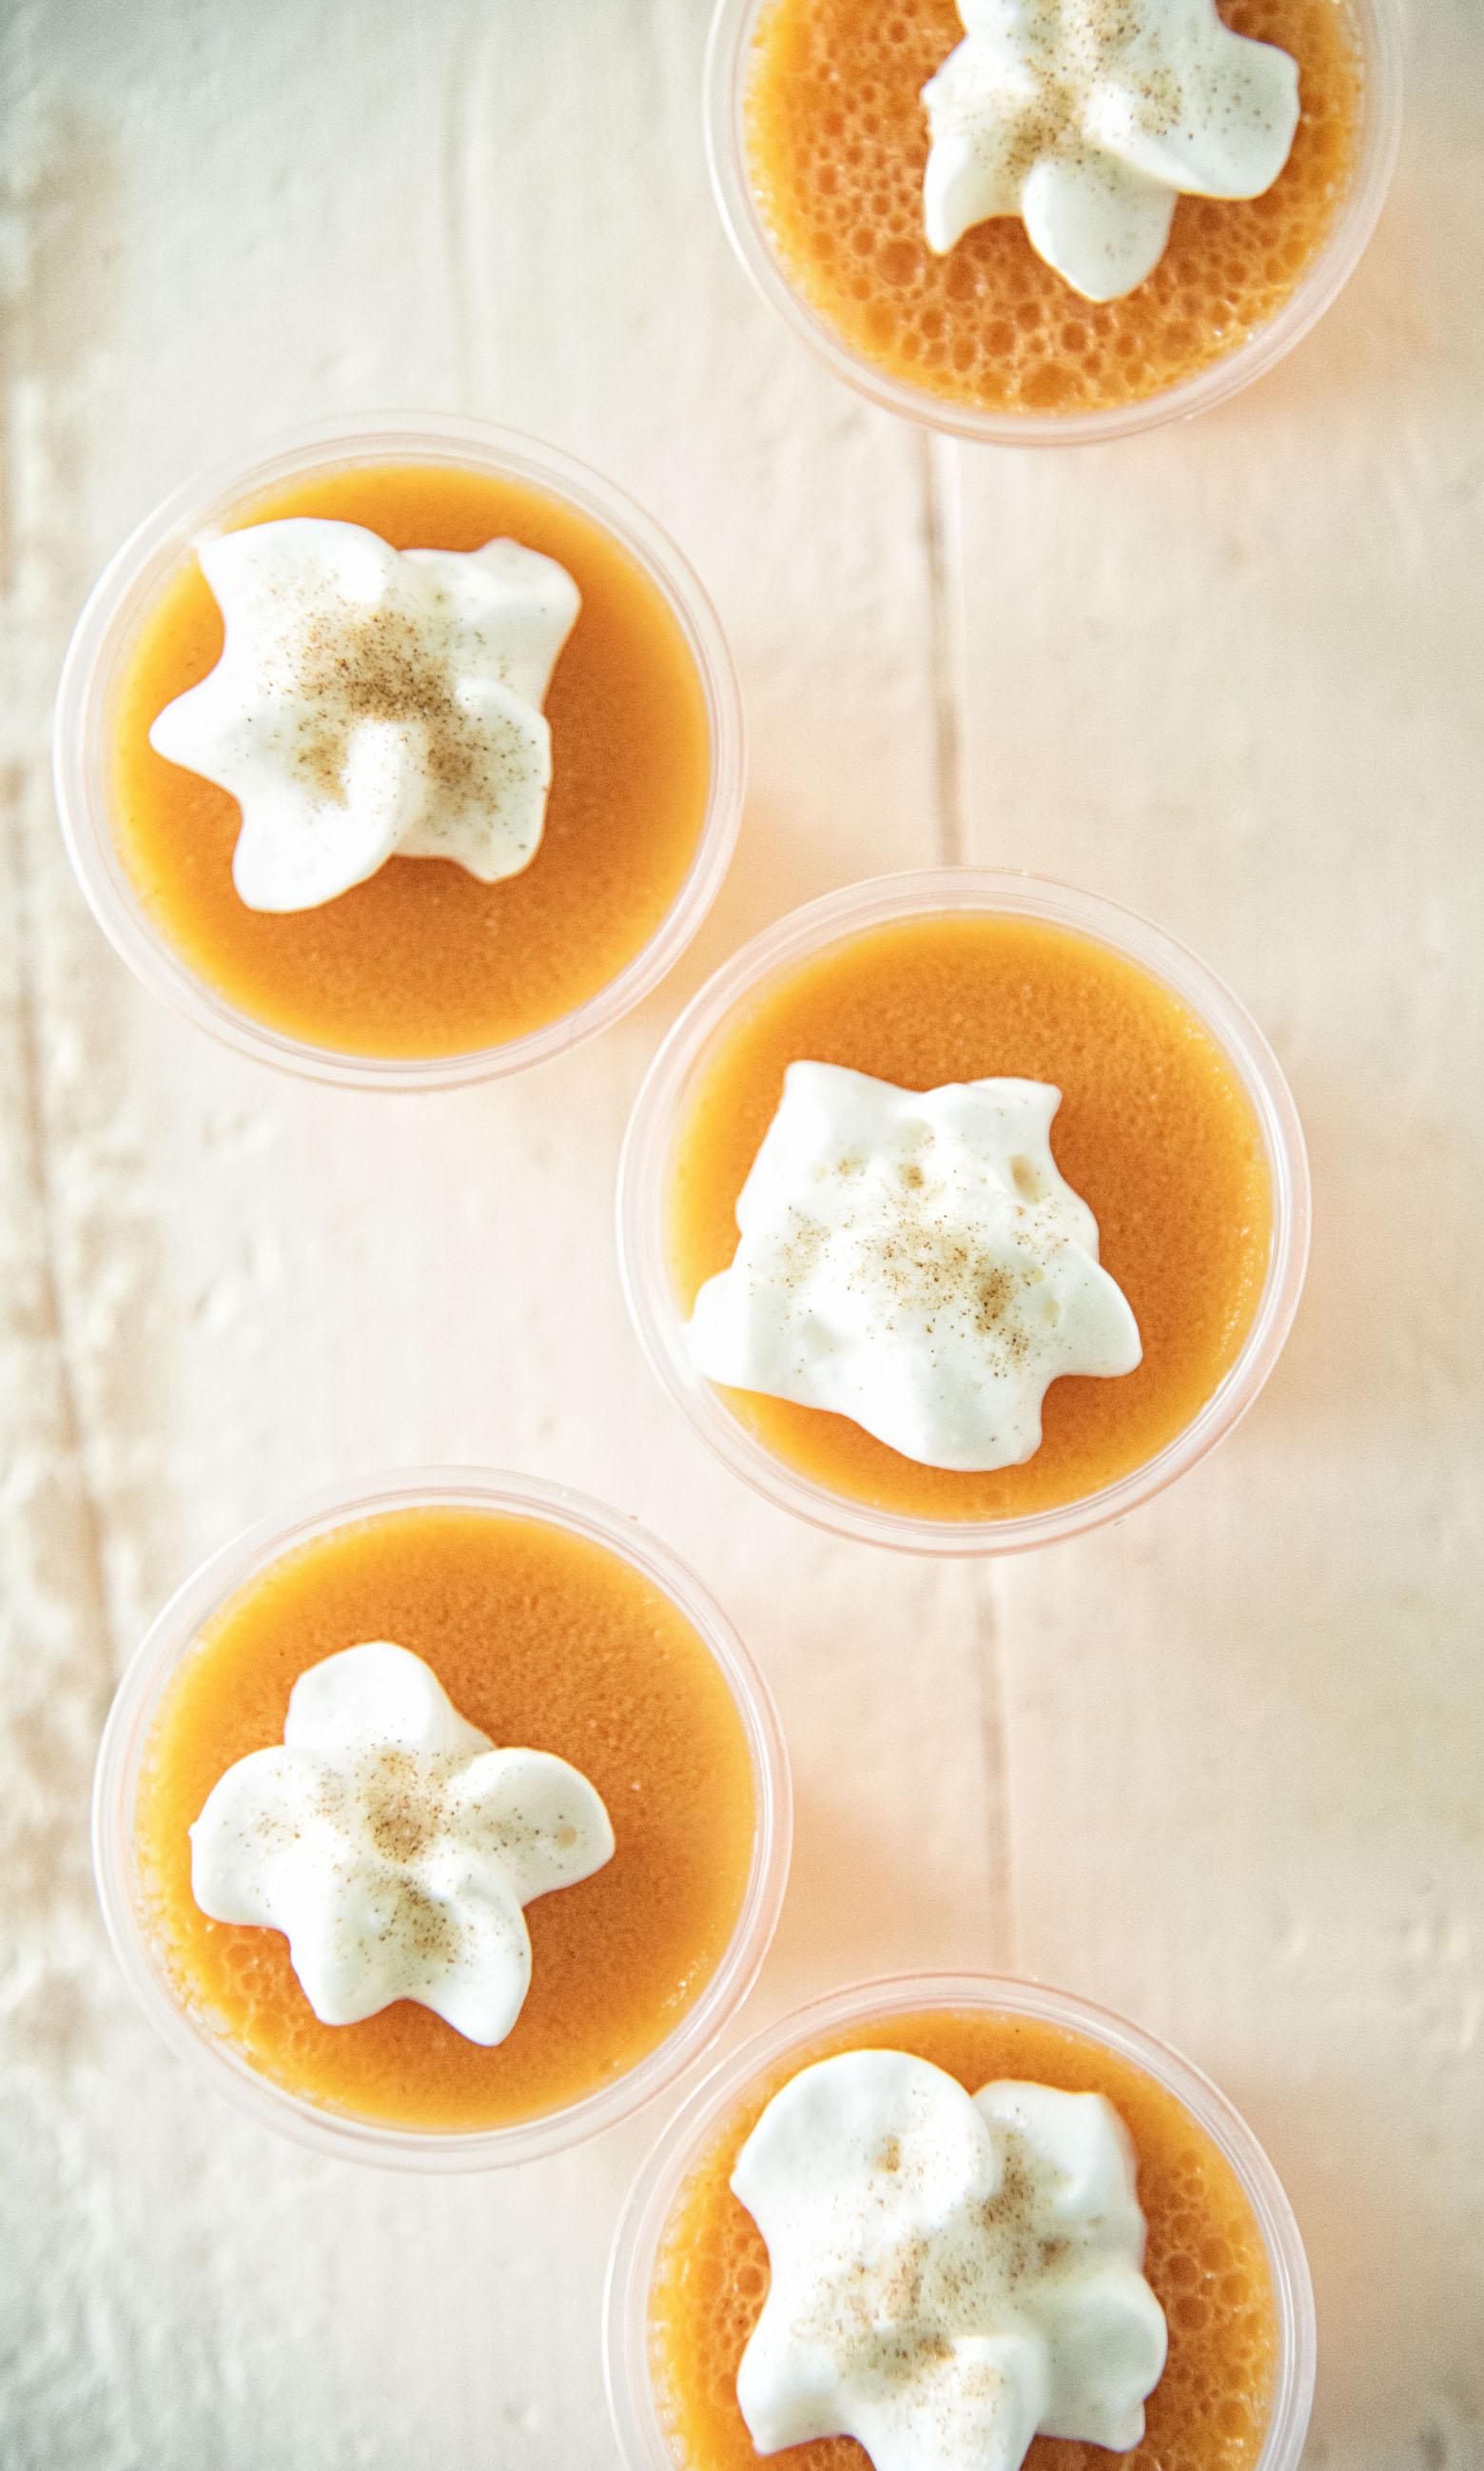 Orange Cinnamon Roll Jell-O Shot